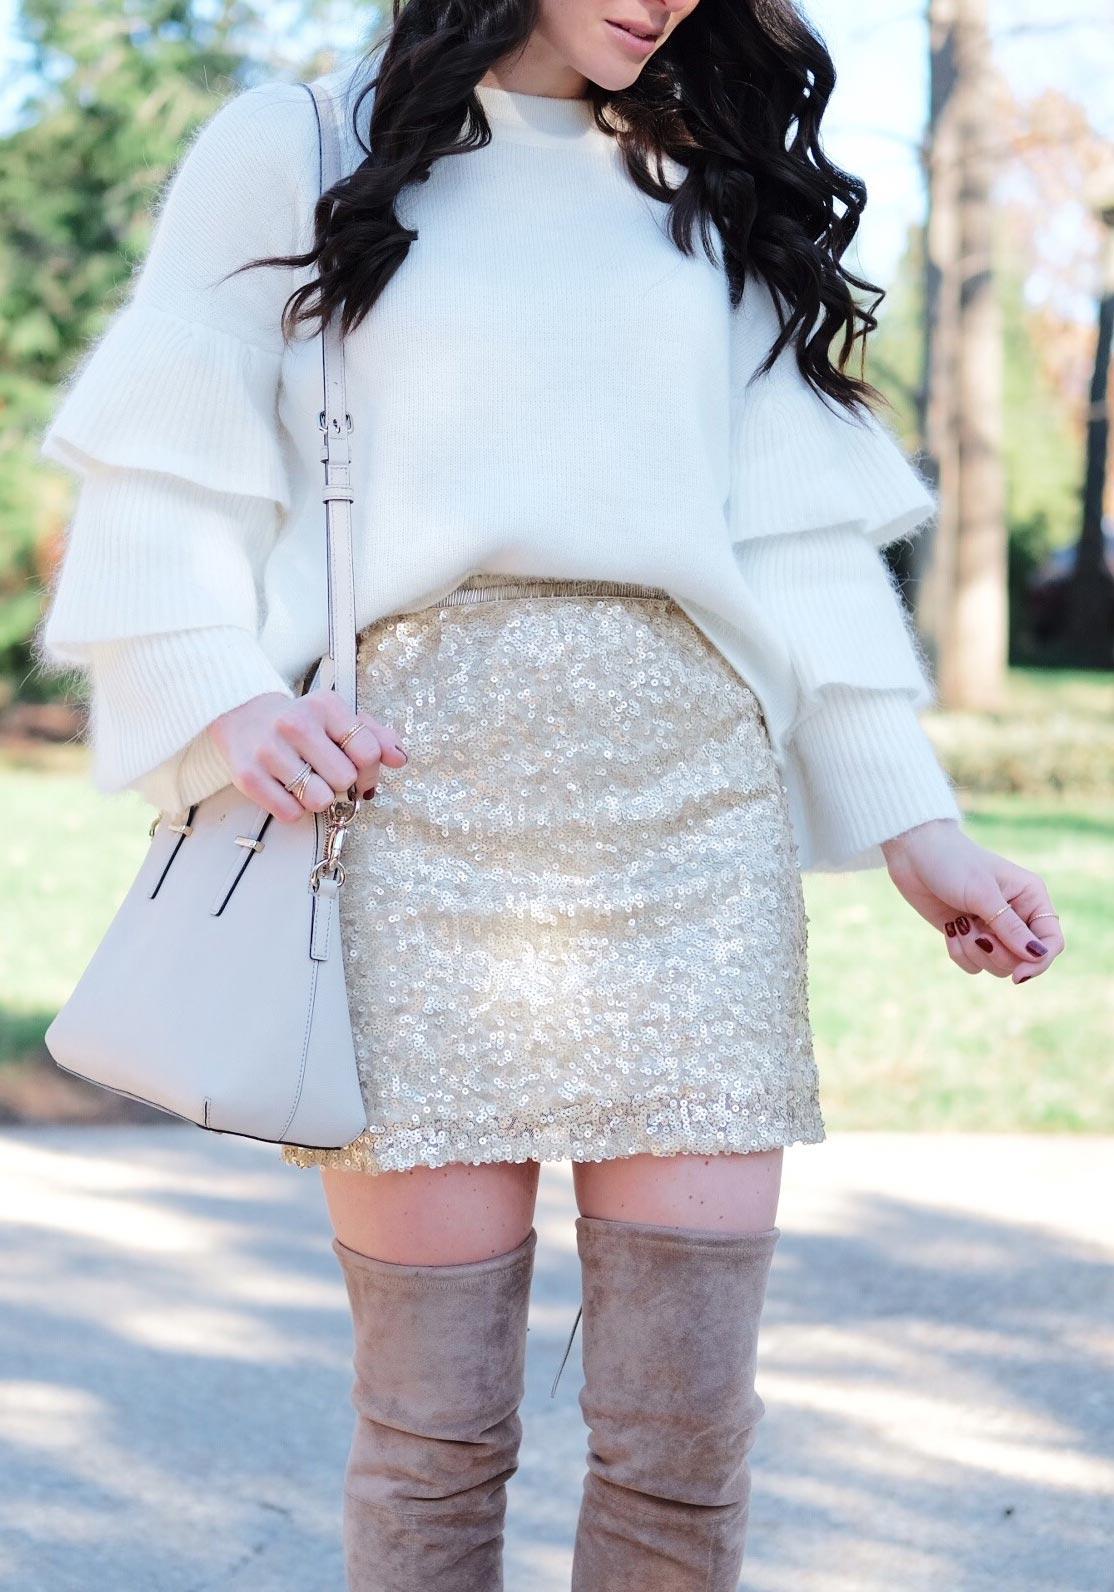 New Year's Eve Outfit Ideas, Sequin Skirt, Endless Rose Ruffle Sleeve Sweater, Stuart Weitzman Highland Dupes, & Kate Spade Cedar Street Maise.